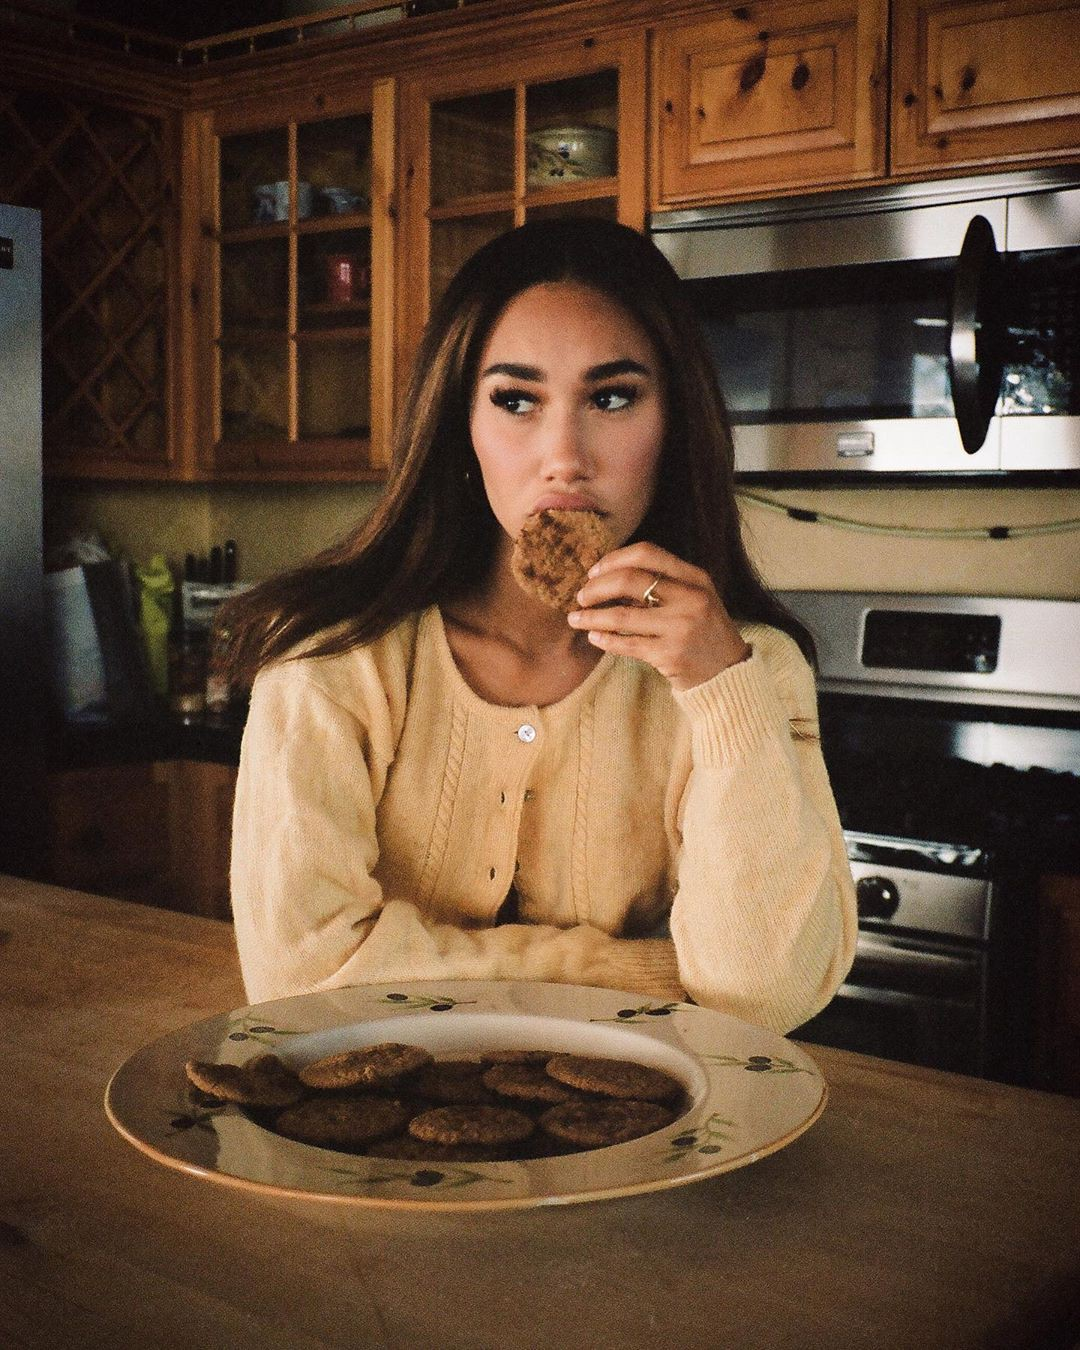 Eva Gutowski Cute Face, Woman Long Hair Style, food craving